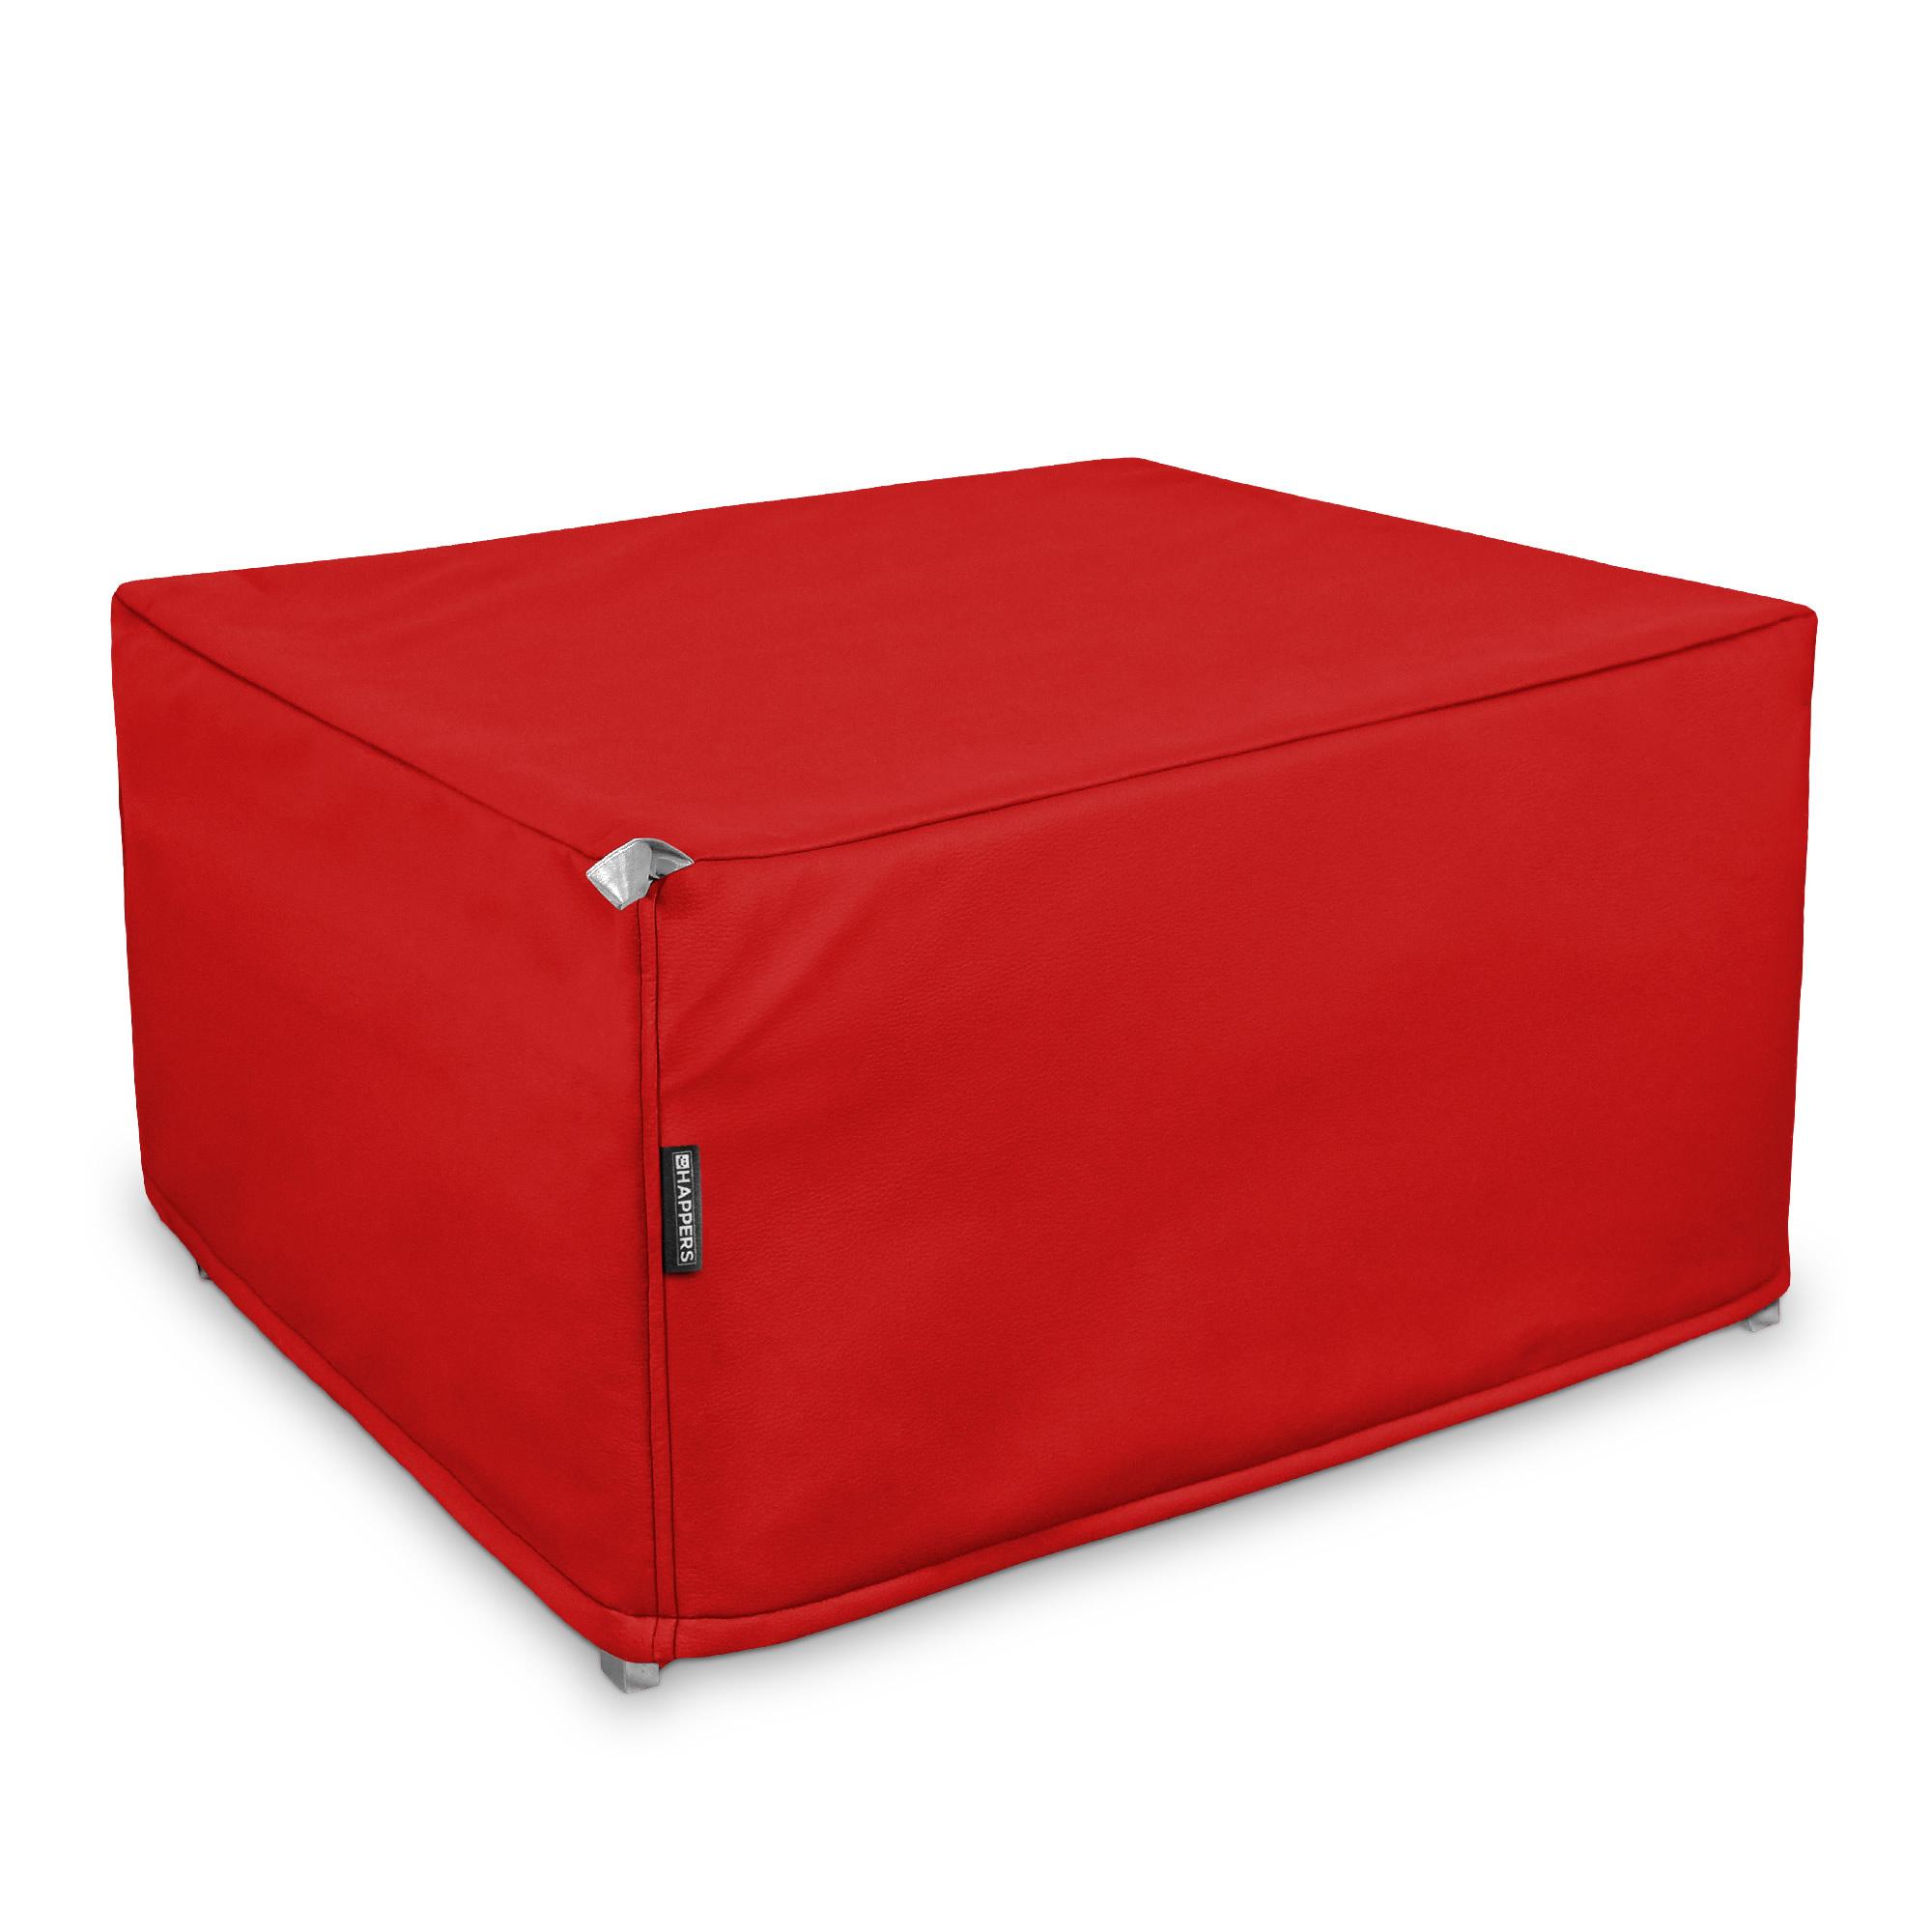 Puff Cama Somier plegable Polipiel Indoor Rojo en puffdepera.com